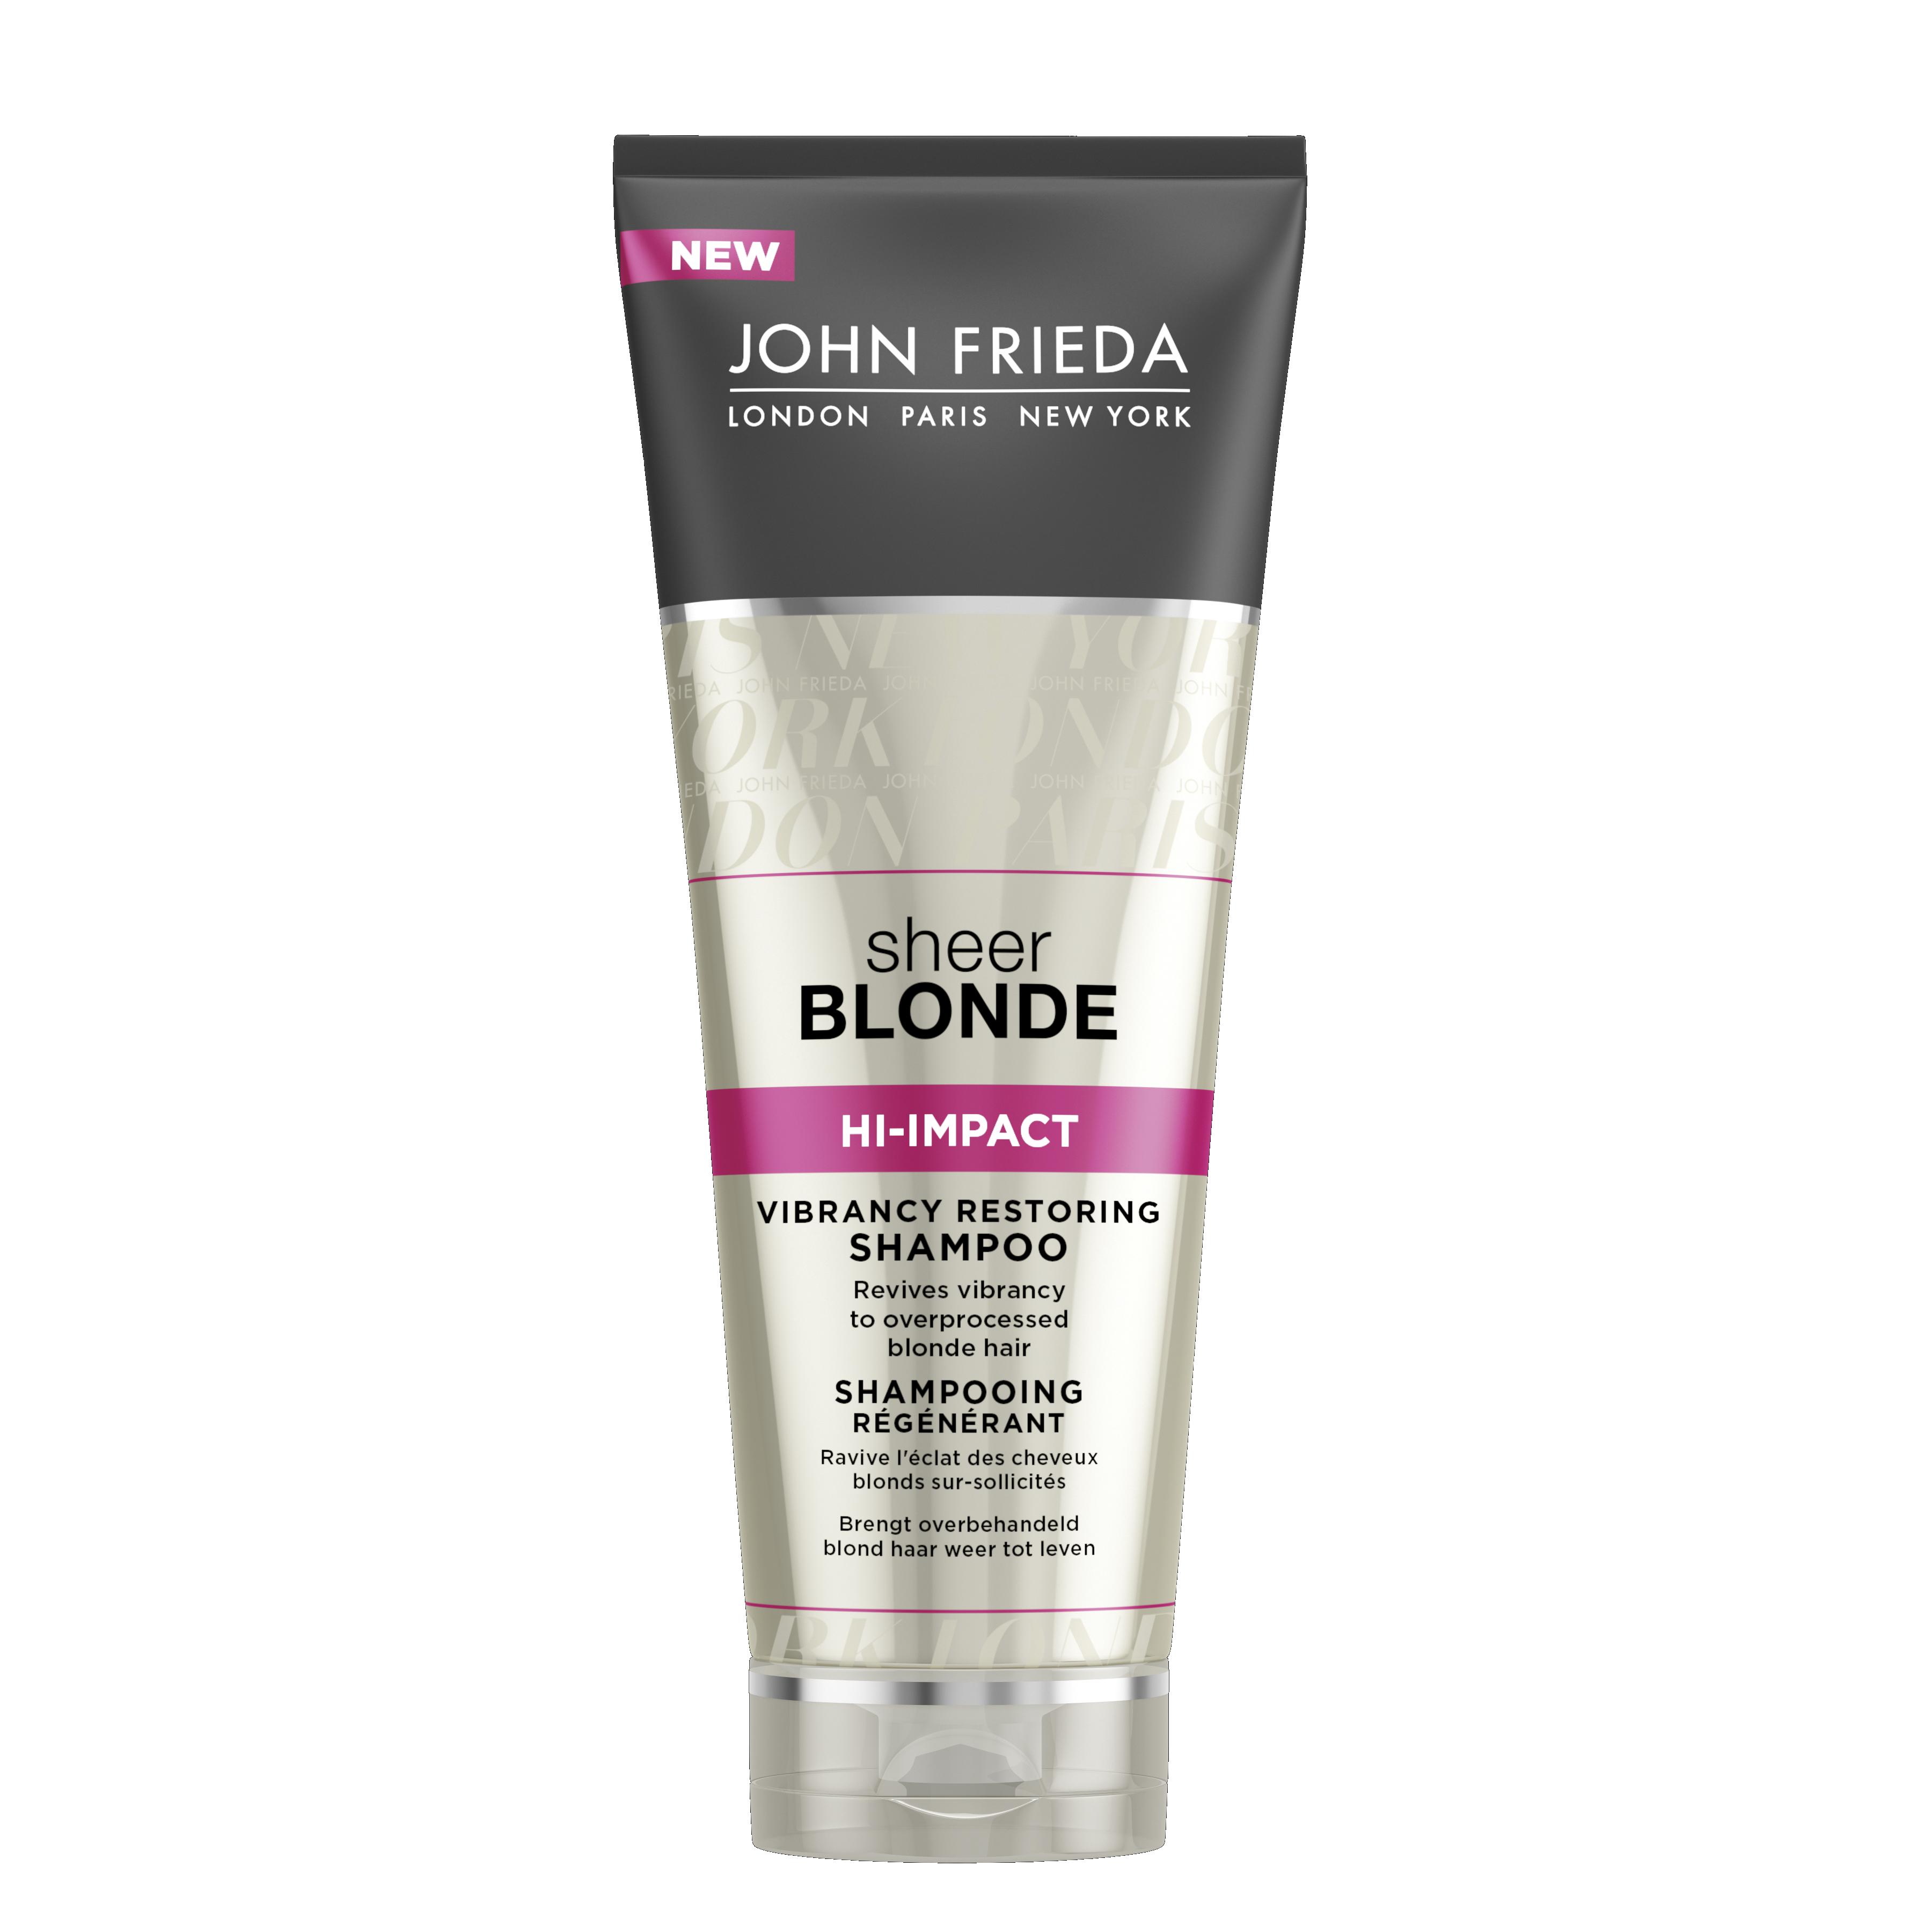 Sheer Blonde Hi-Impact Shampoo 250ml